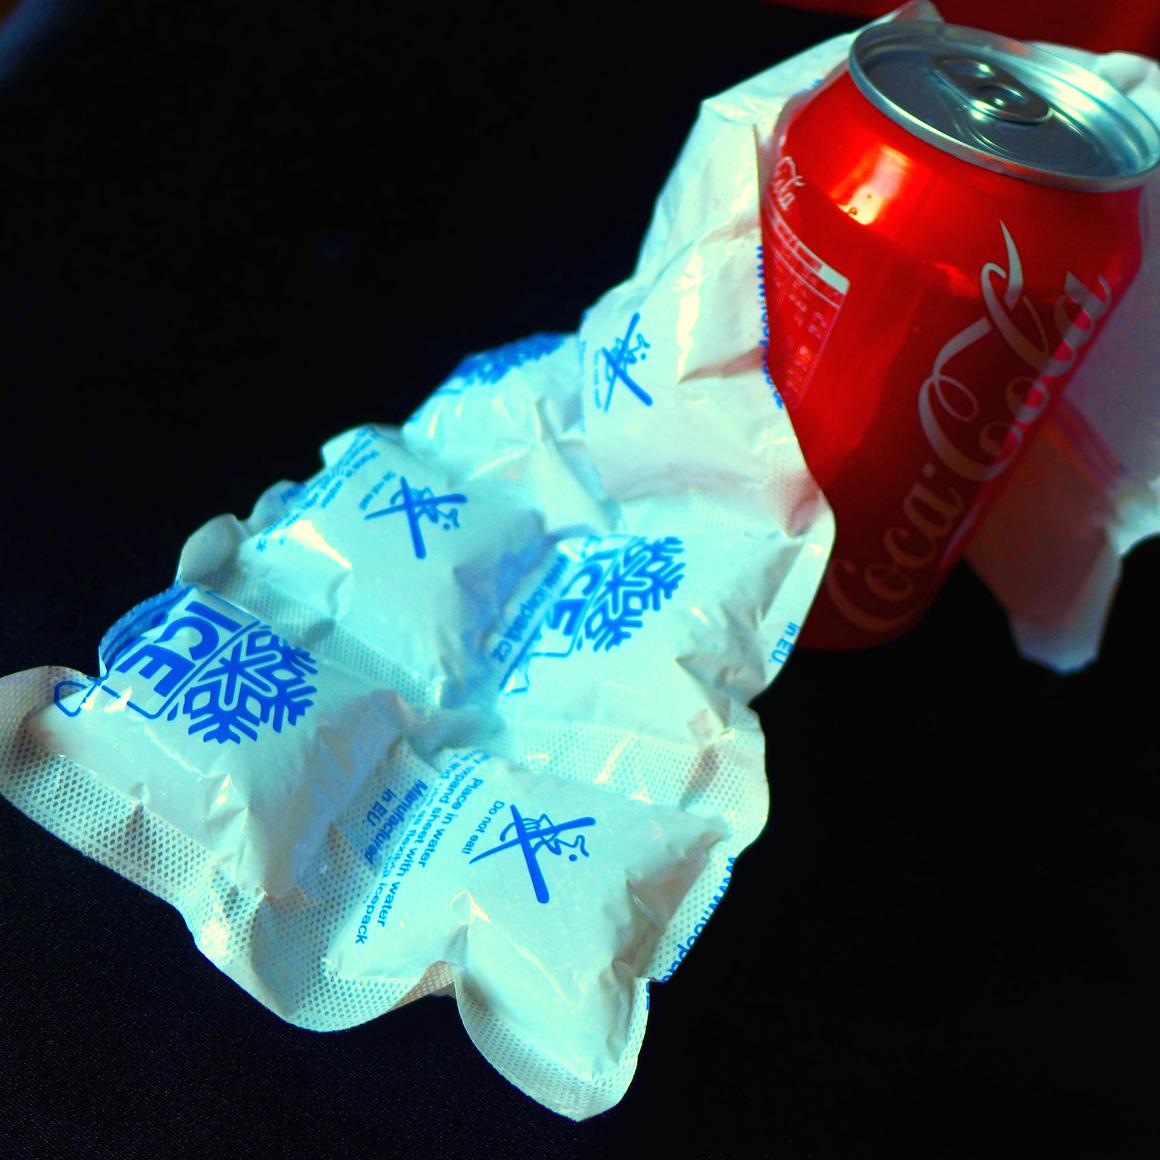 Icepads cola